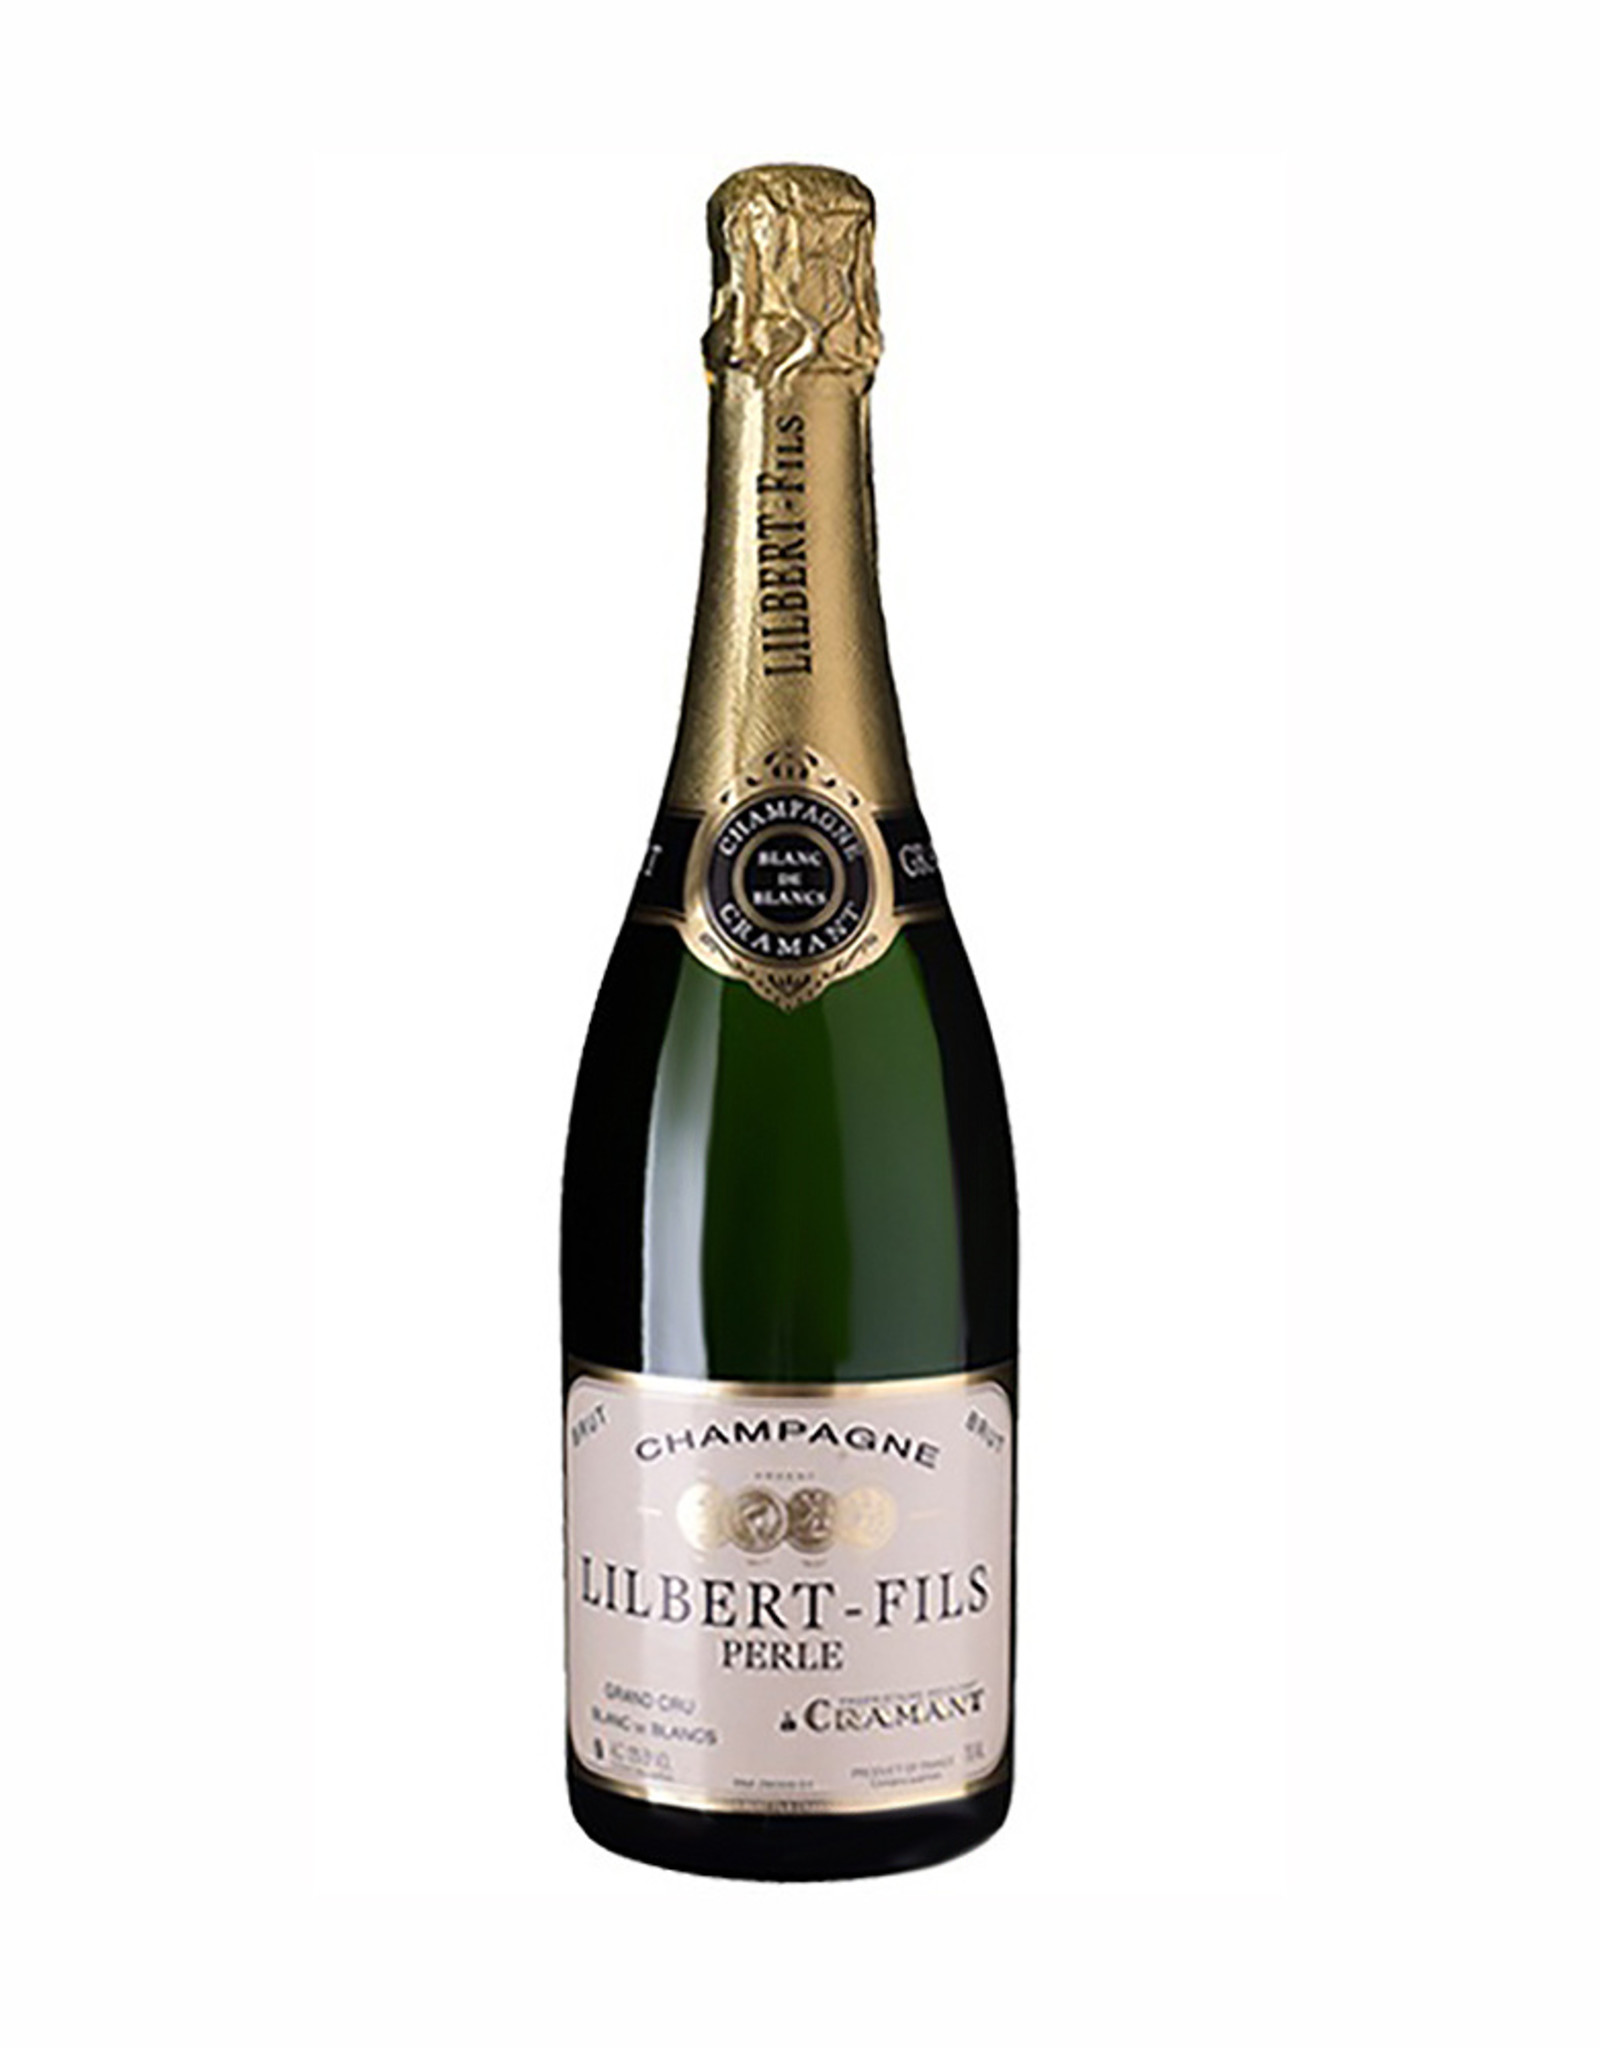 Lilbert Fils Champagne Grand Cru Blanc de Blancs 'Perle'